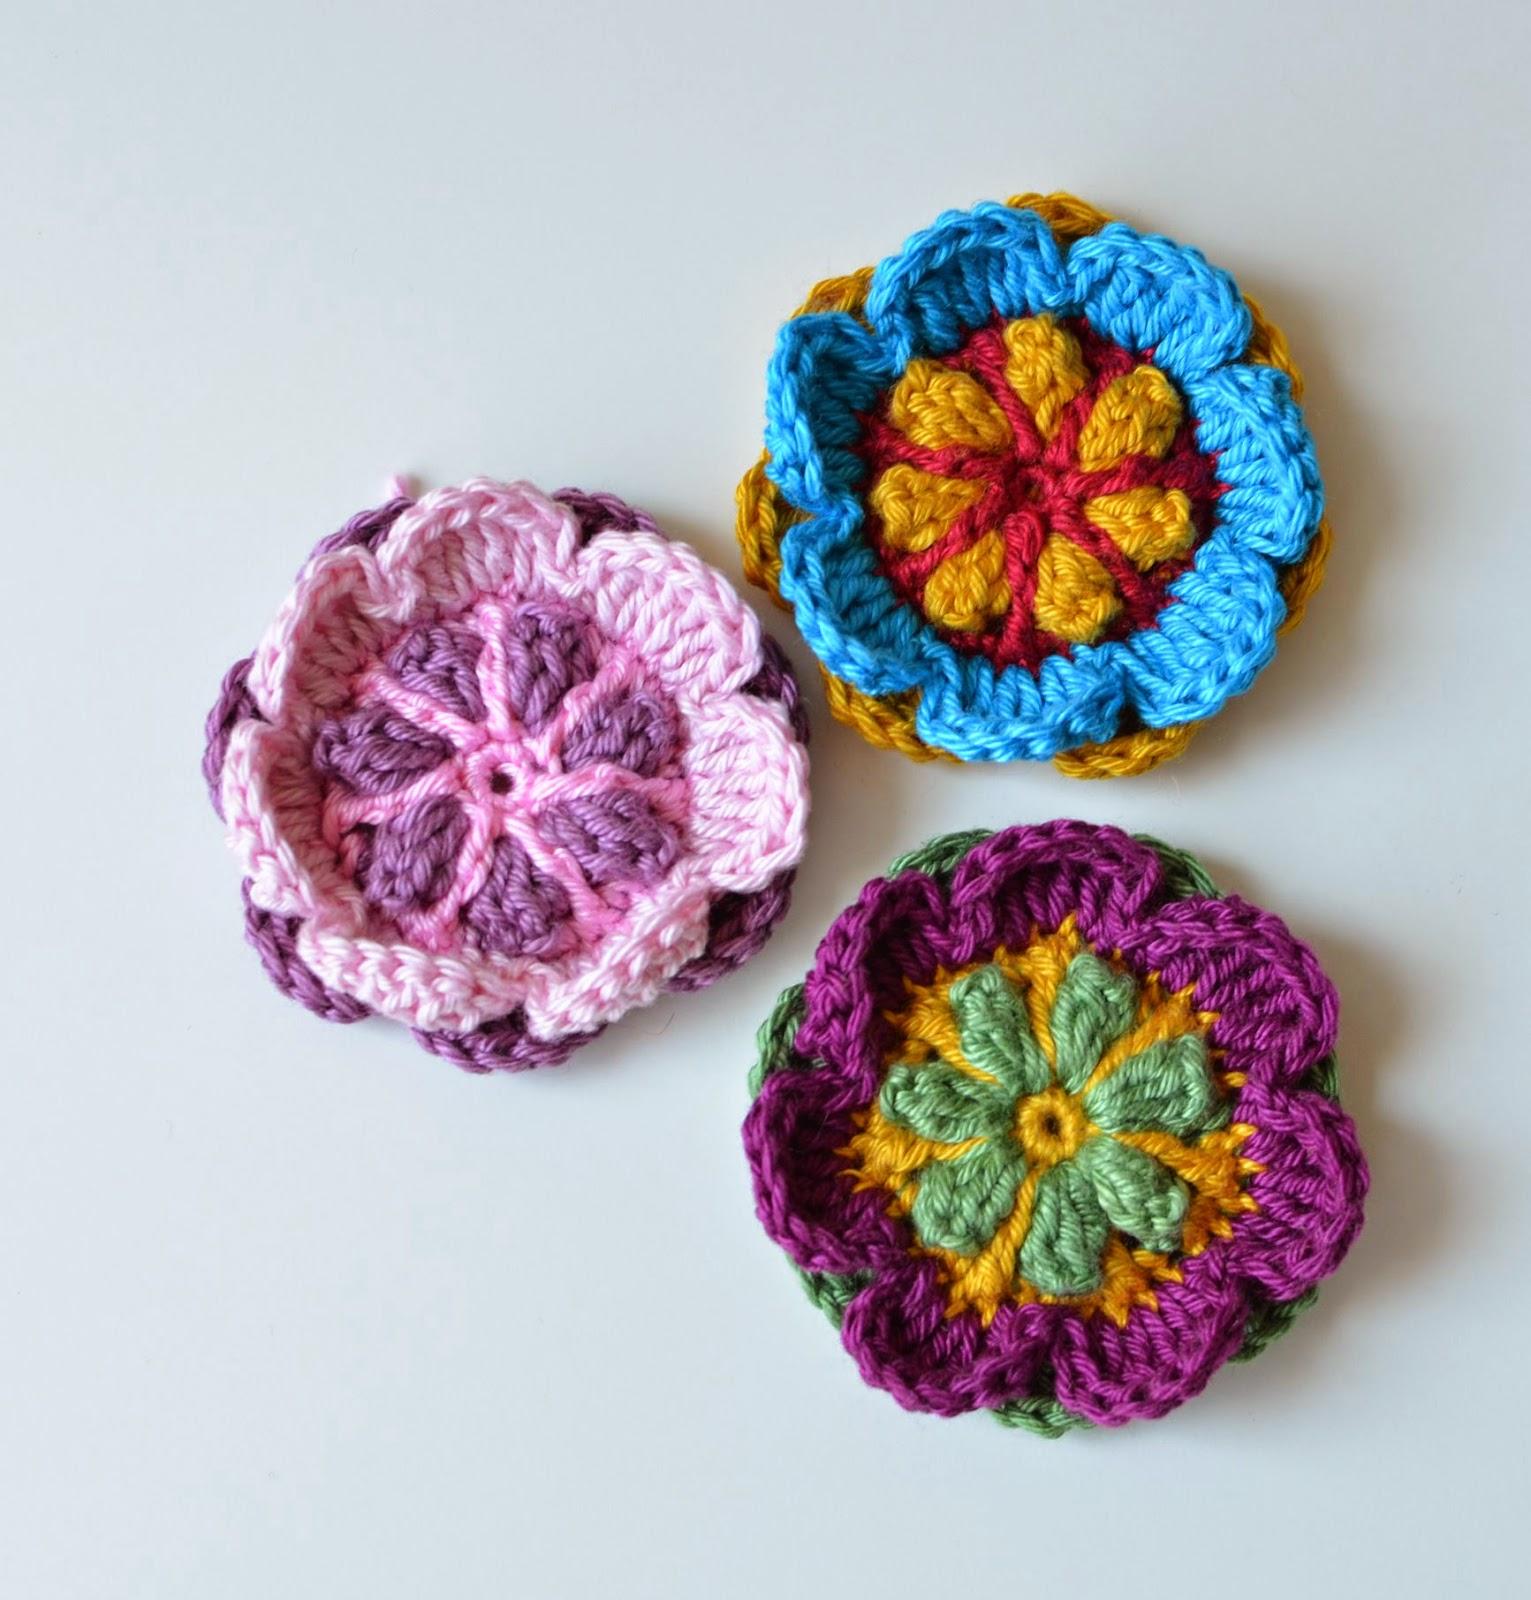 Crochet A Flower Brooch Pattern : Free Pattern: Overlay Flower Brooch LillaBj?rns Crochet ...